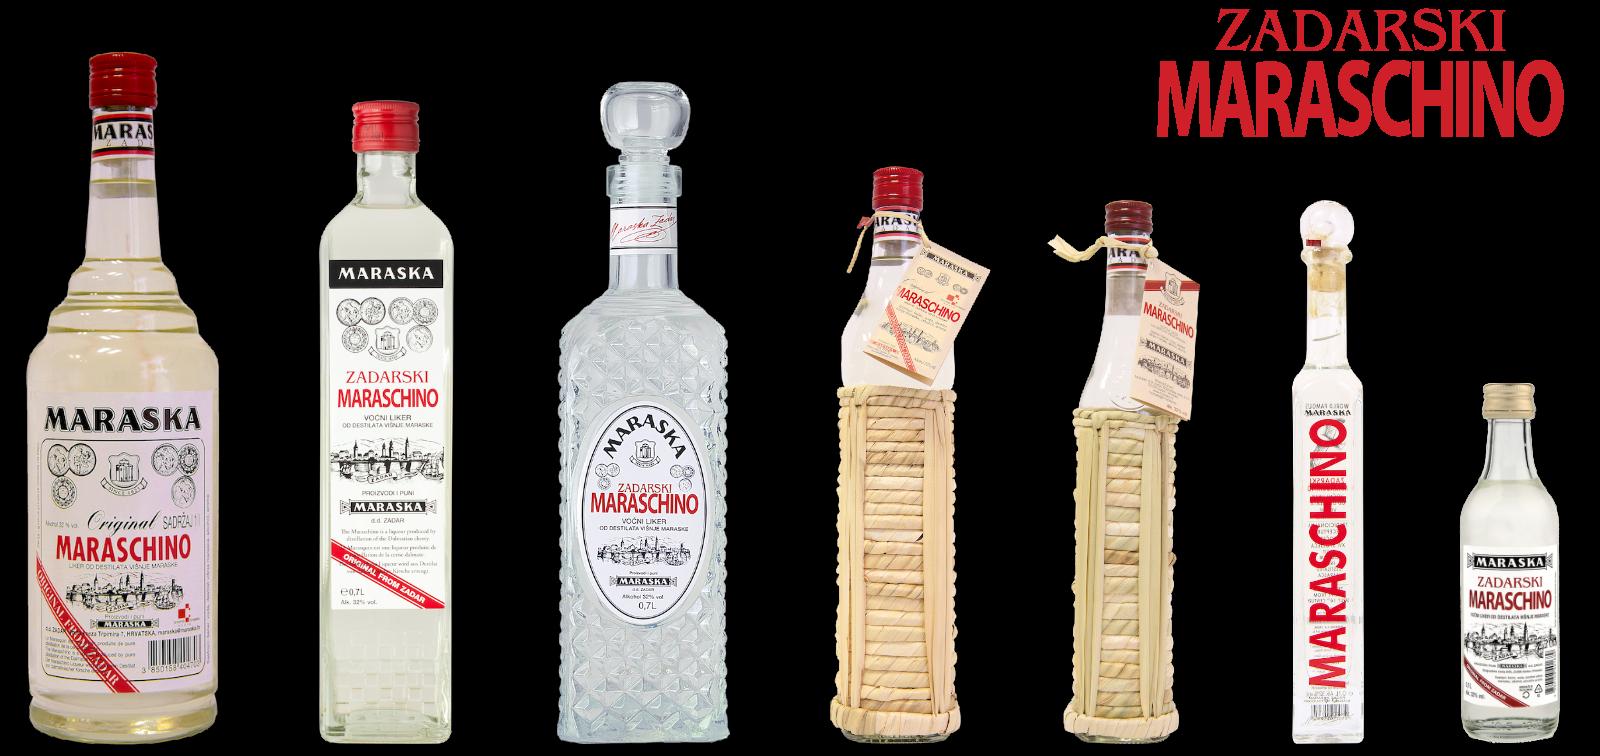 Maraschino kolekcija